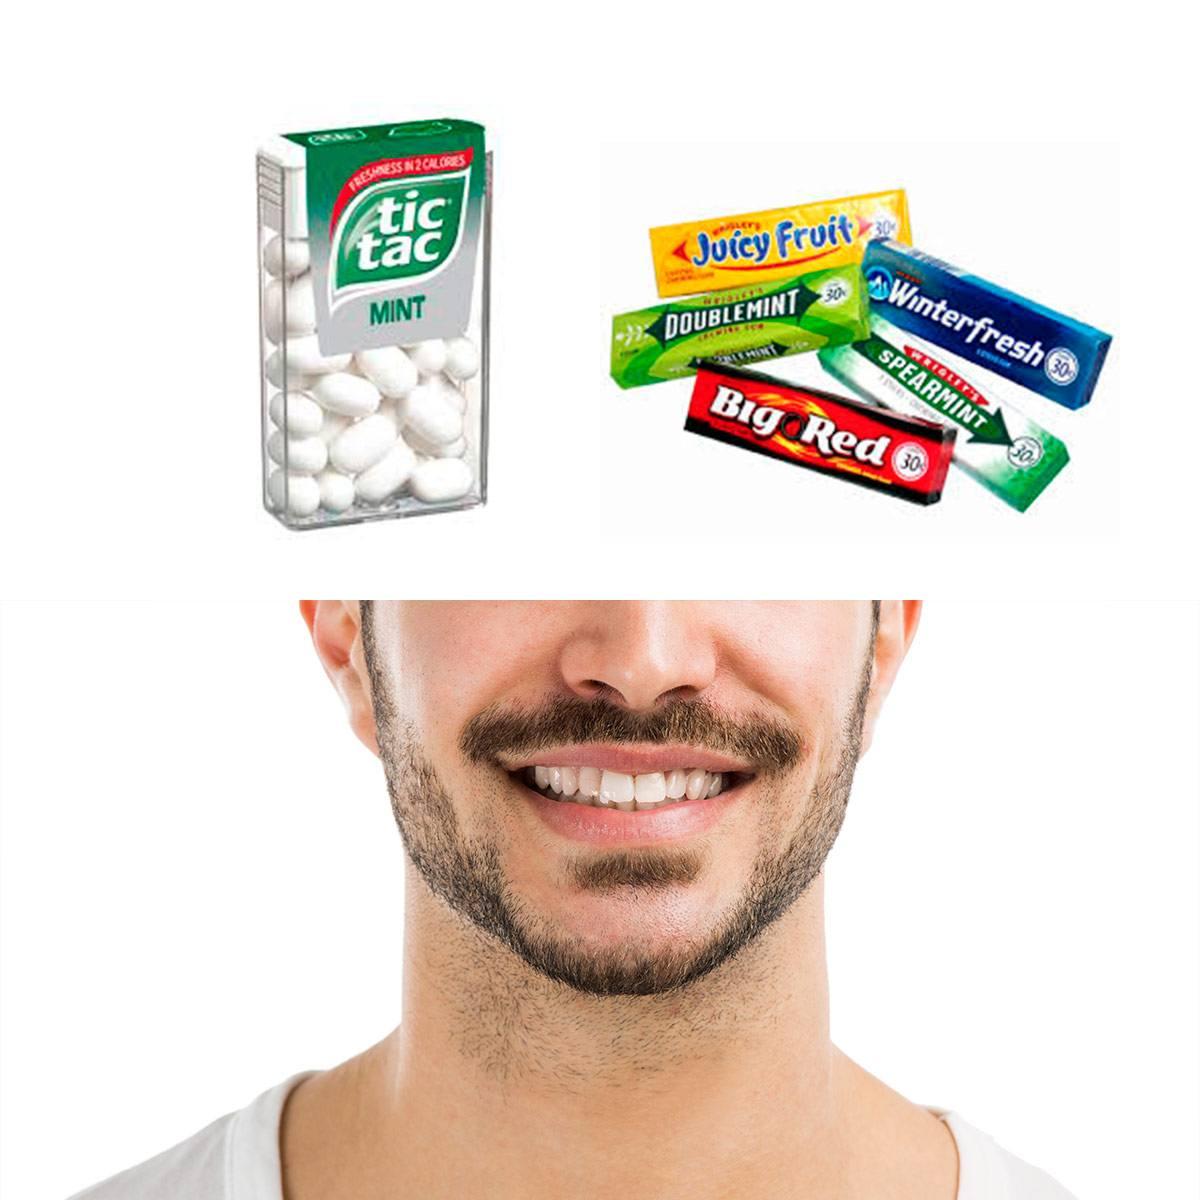 Tic Tac Mint, gum and a smiling man